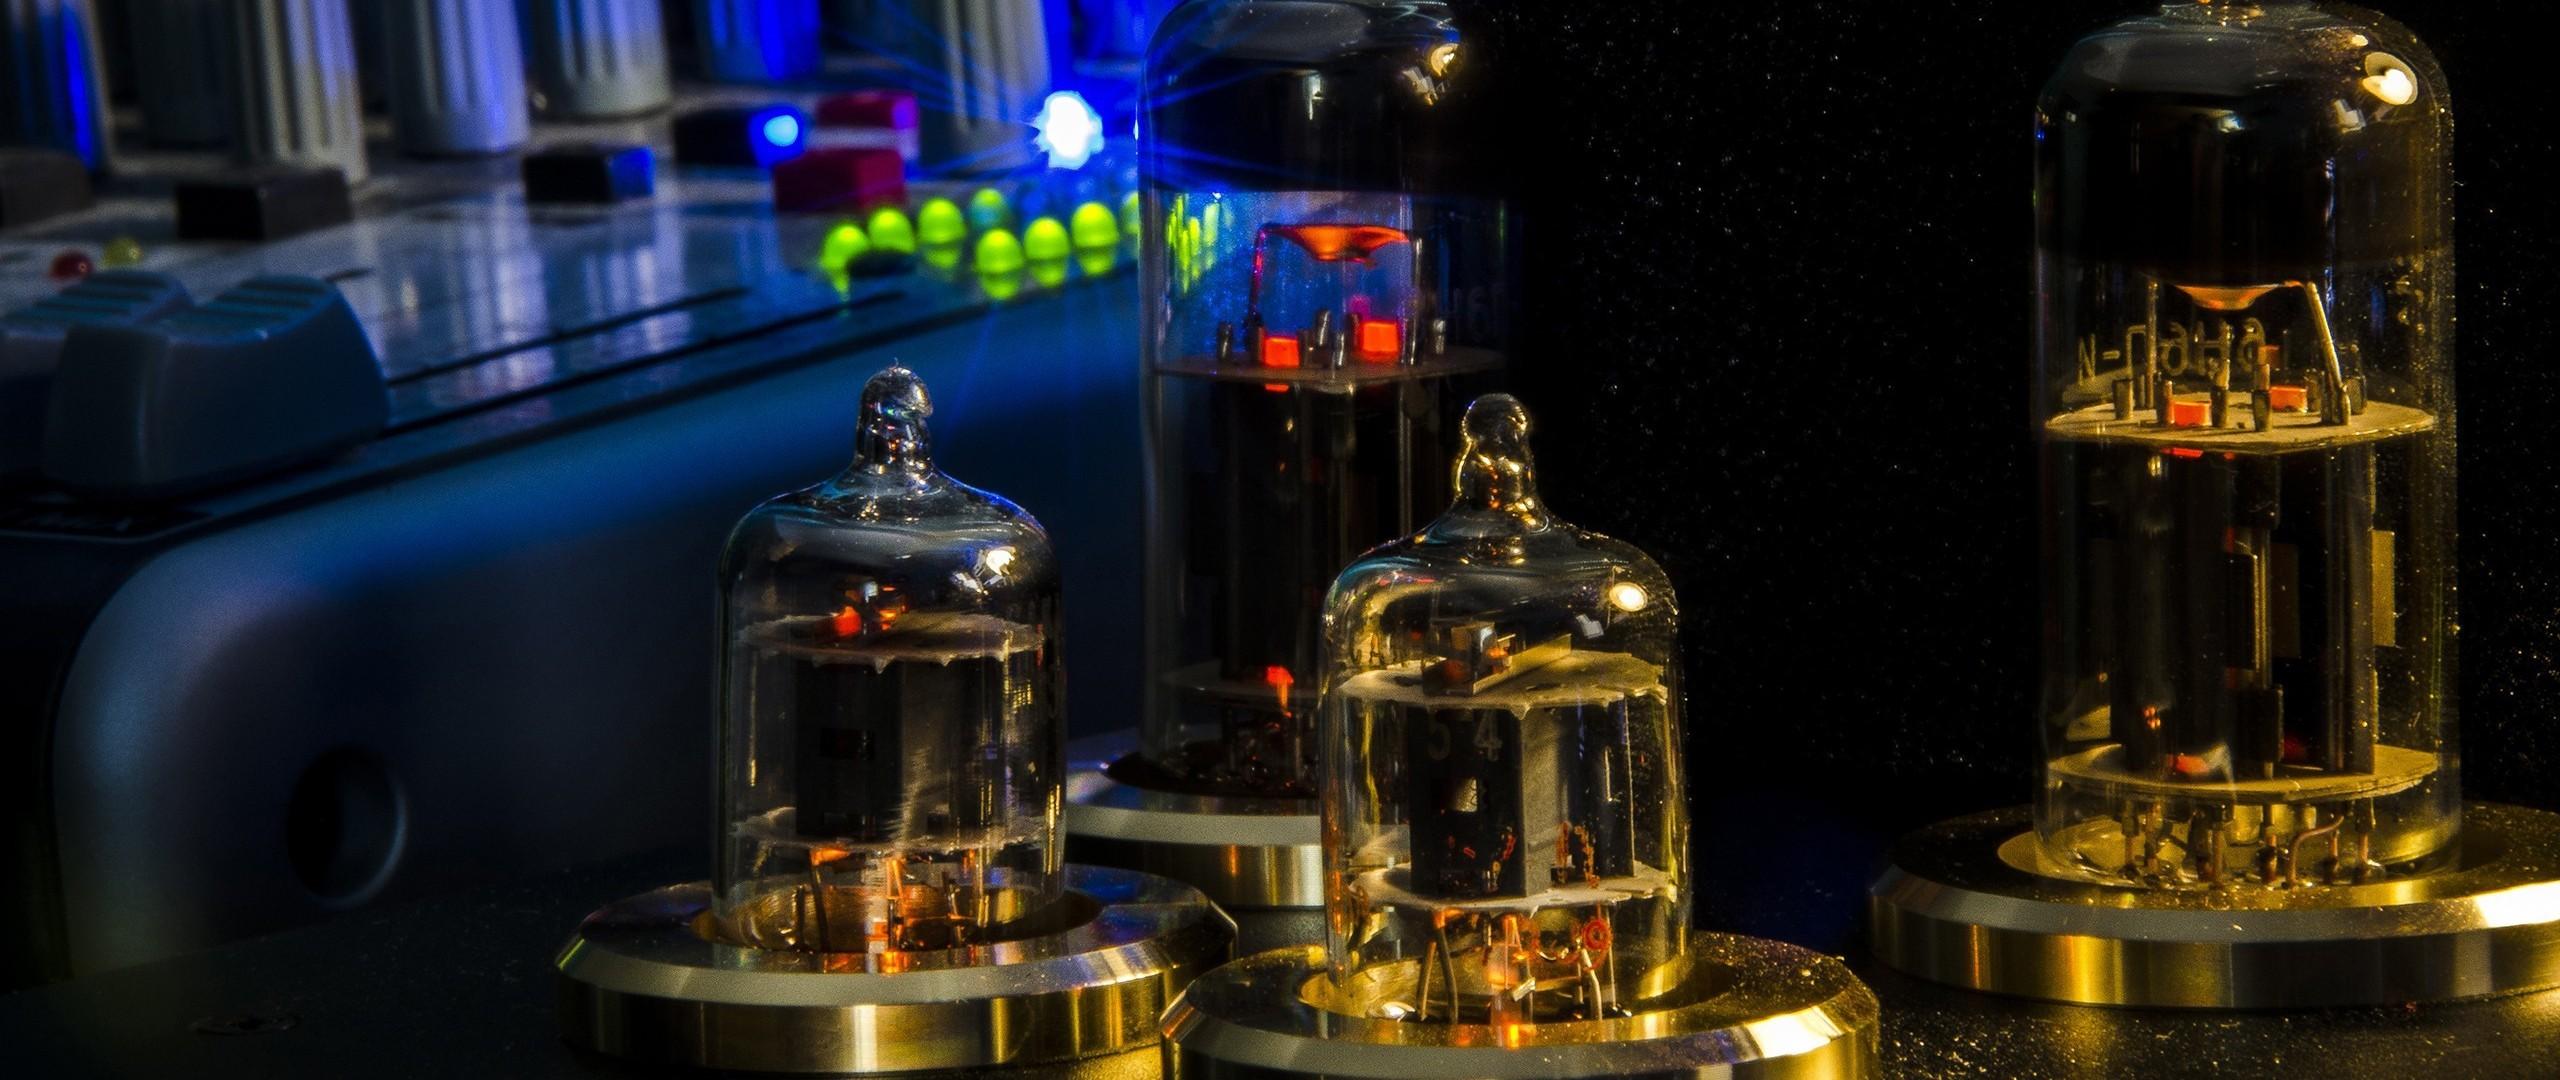 General 2560x1080 amplifiers sound mixers technology vacuum tubes audio-technica